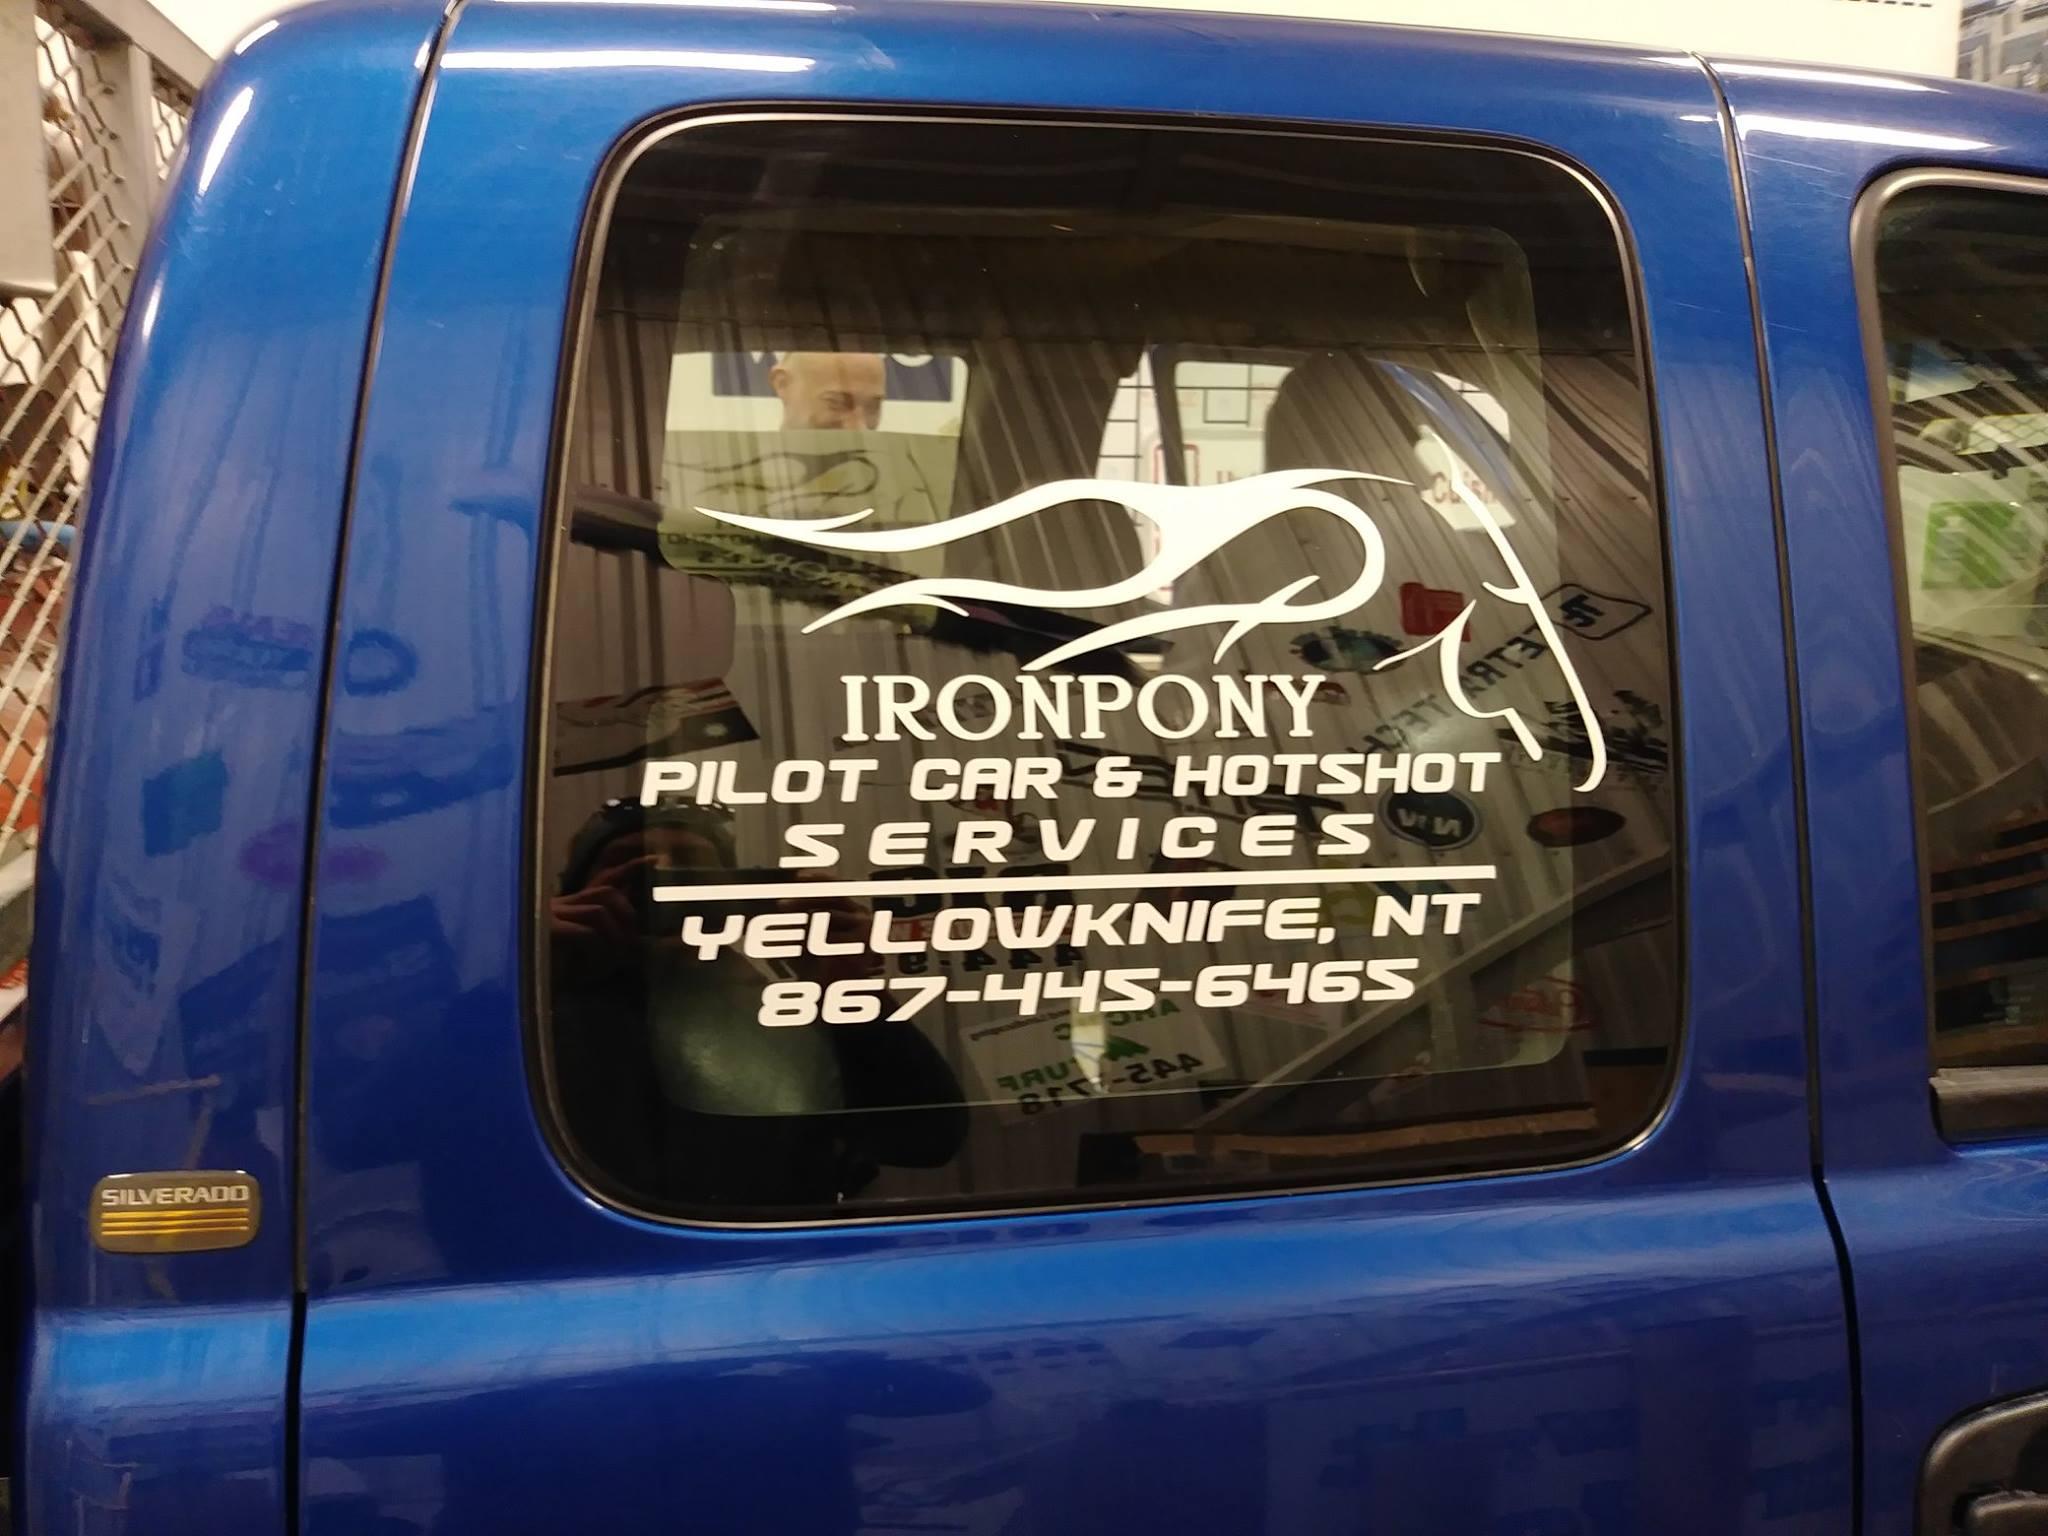 IronPony Pilot Car & Hot Shot Services Vehicle Window Decal.